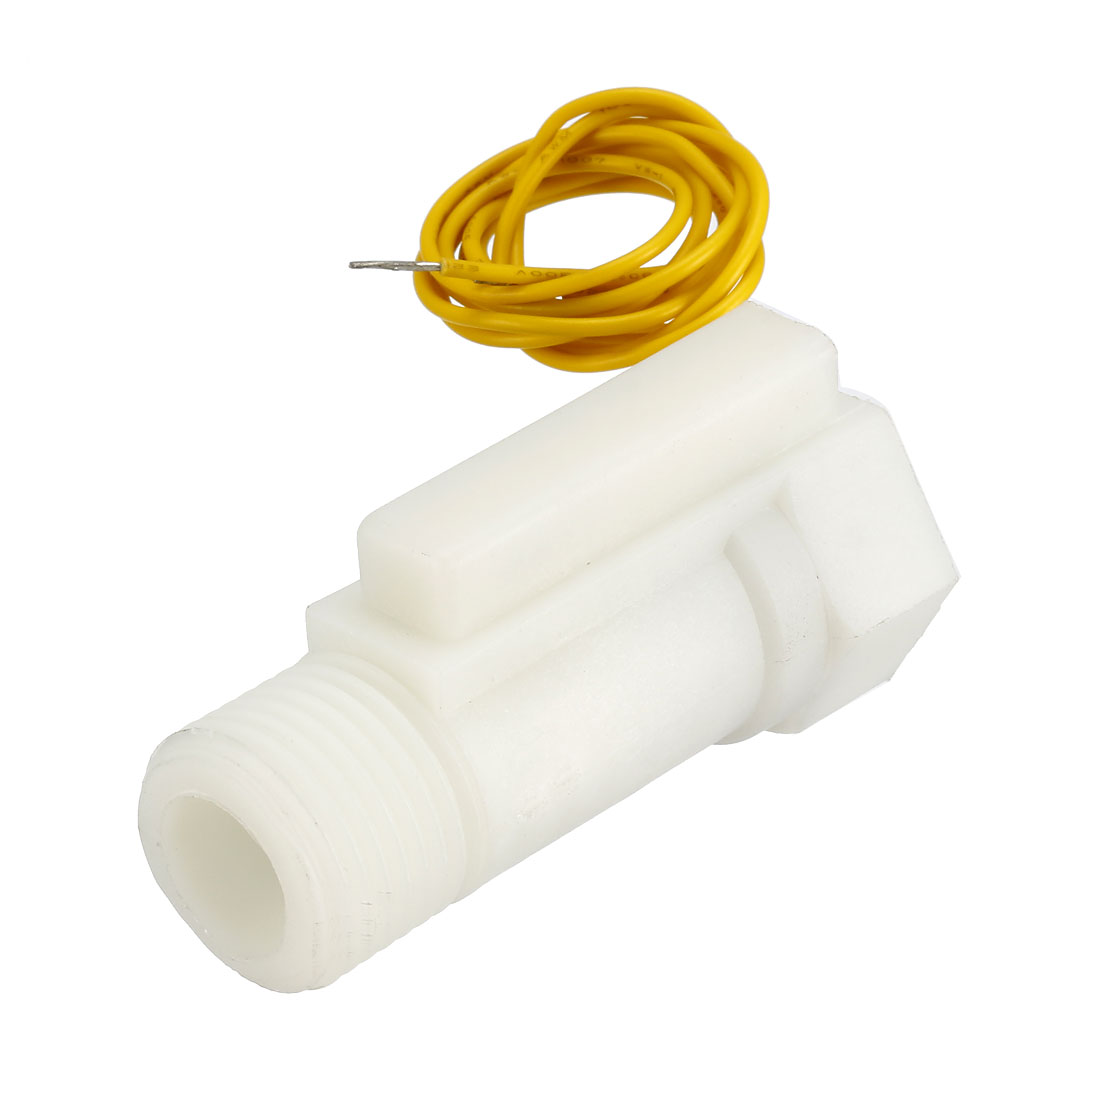 G1/2 Hall Effect Liquid Water Flow Sensor Switch Flowmeter Counters 1-25L/min